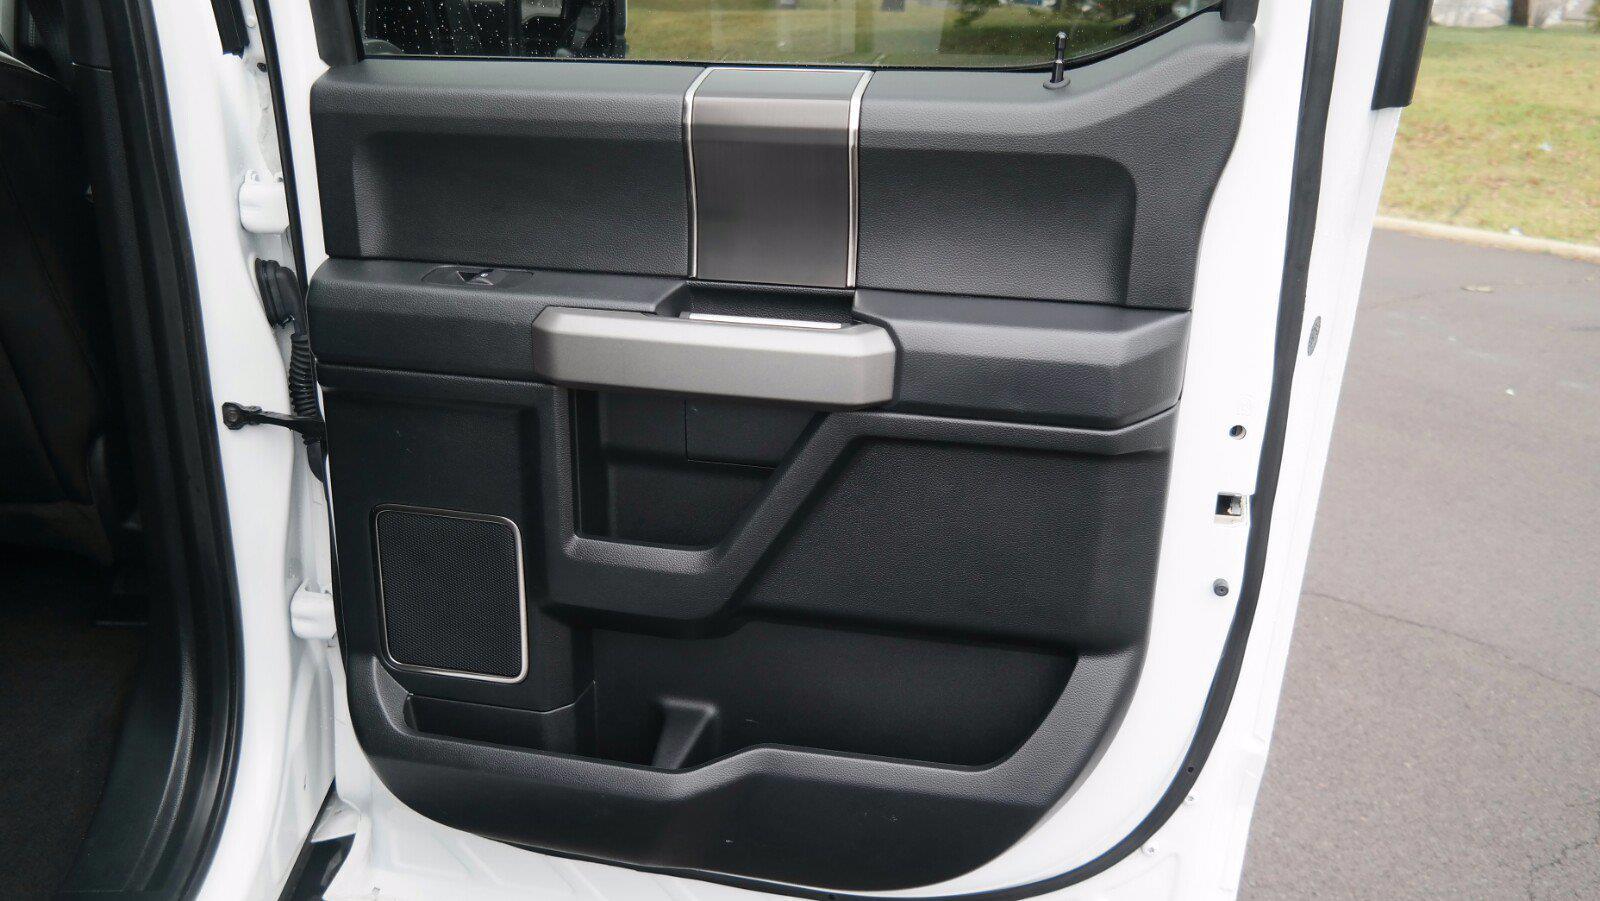 2019 Ford F-150 SuperCrew Cab 4x4, Pickup #FL010231 - photo 30